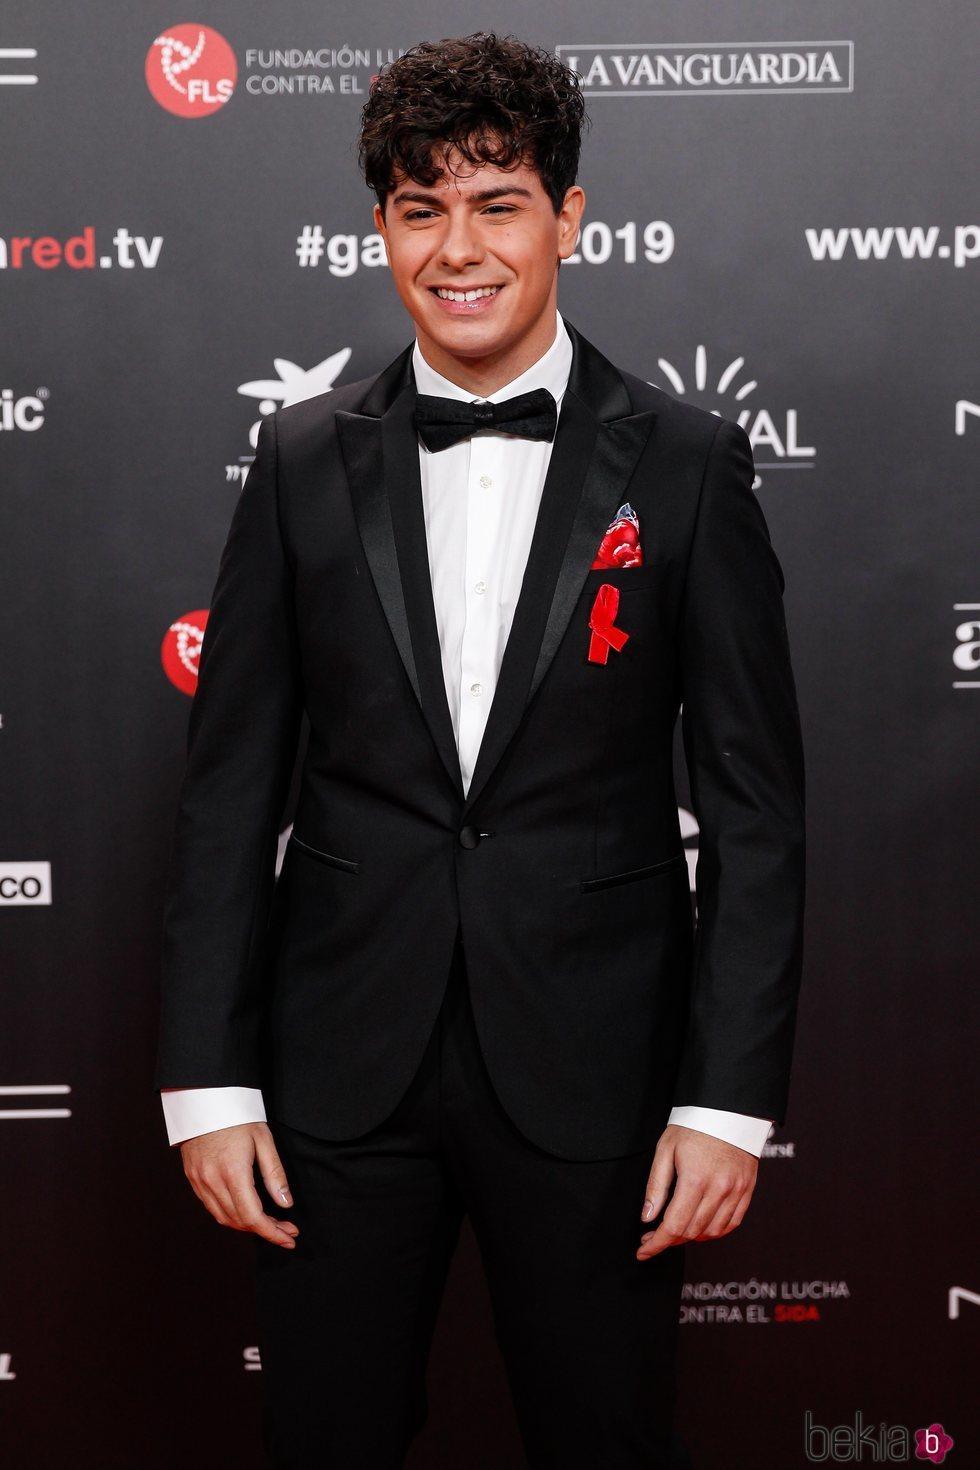 Alfred García en la gala People in Red 2019